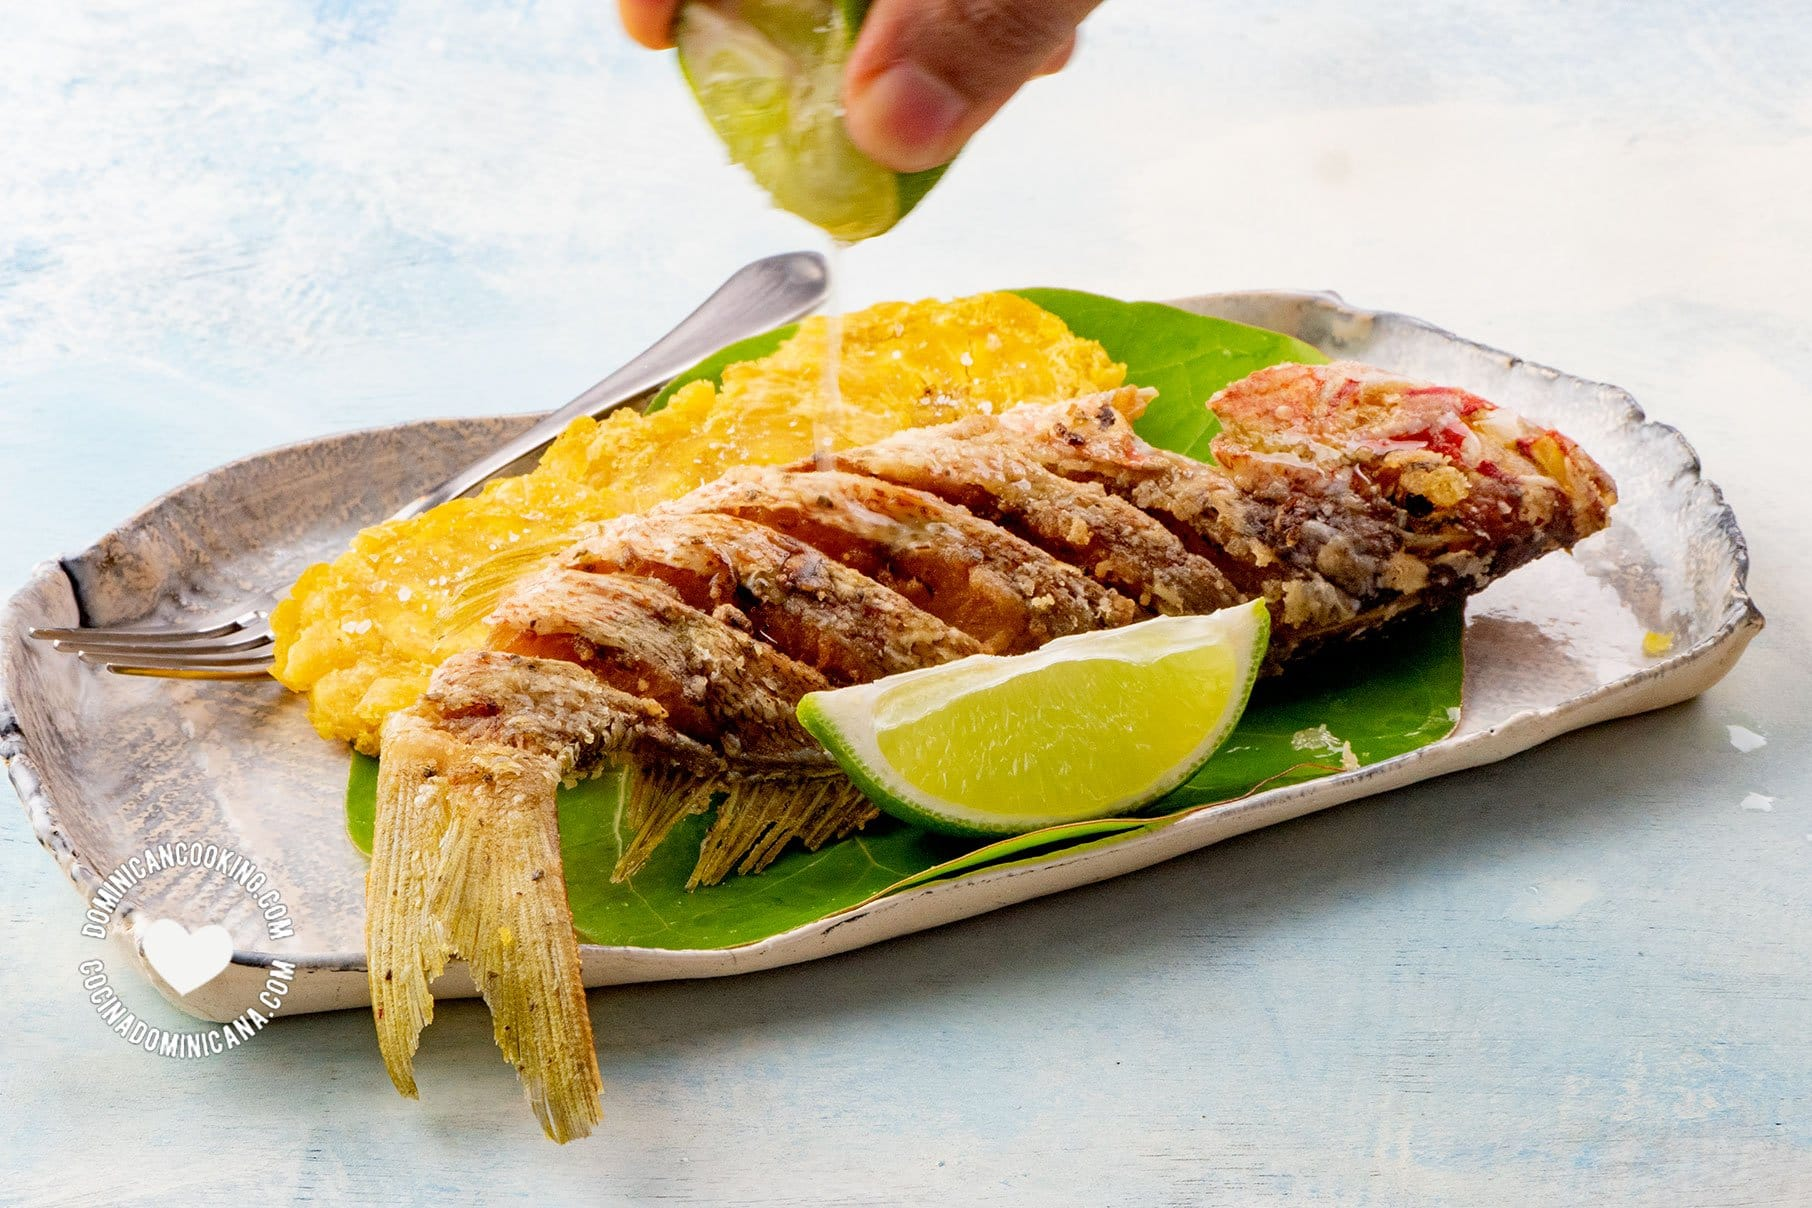 Pescado Frito sobre hojas de uva de playa, con tostones, mano exprime limón